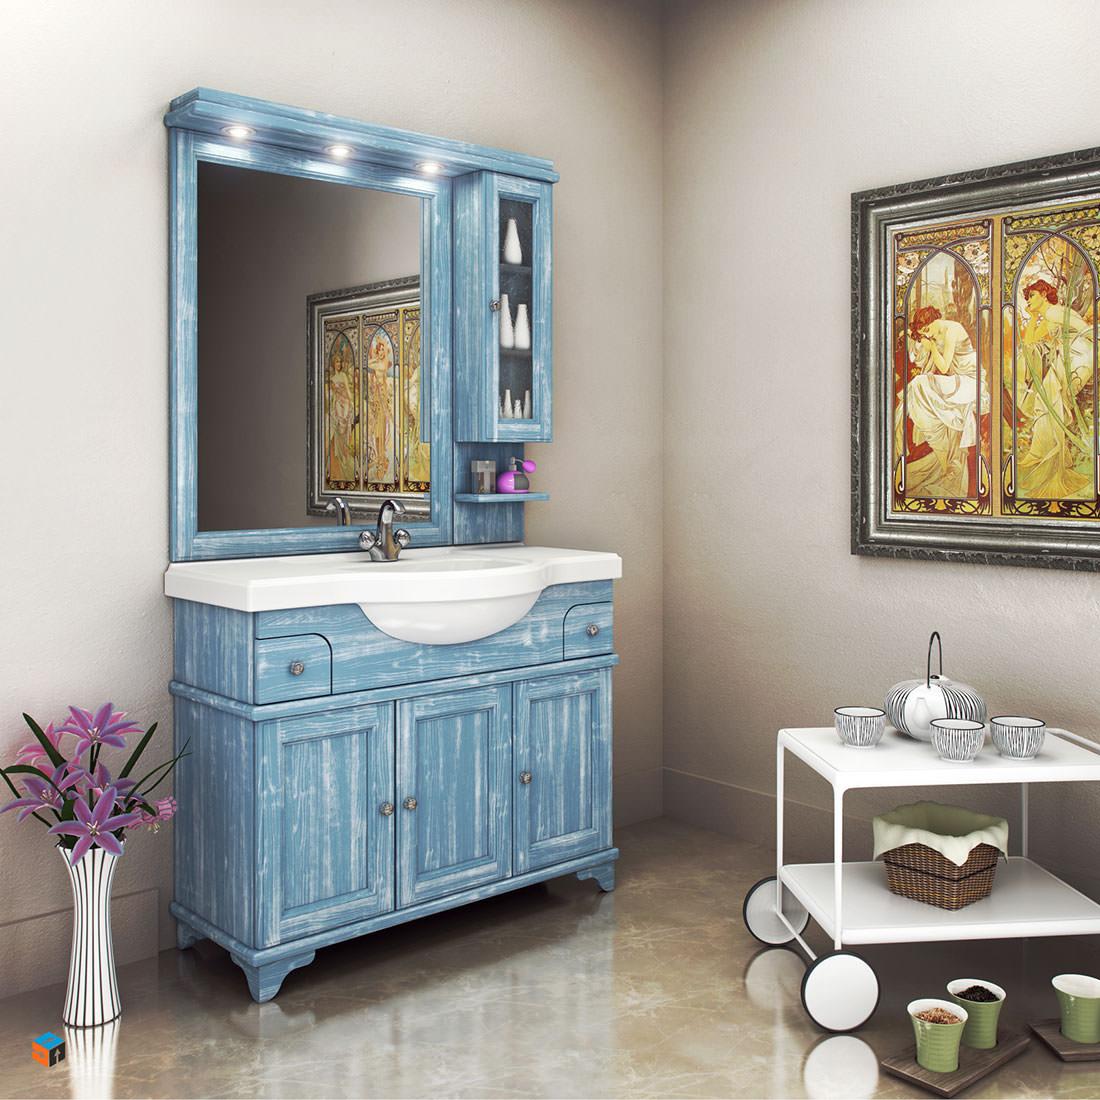 vintage έπιπλο μπάνιου γαλάζιο χρώμα